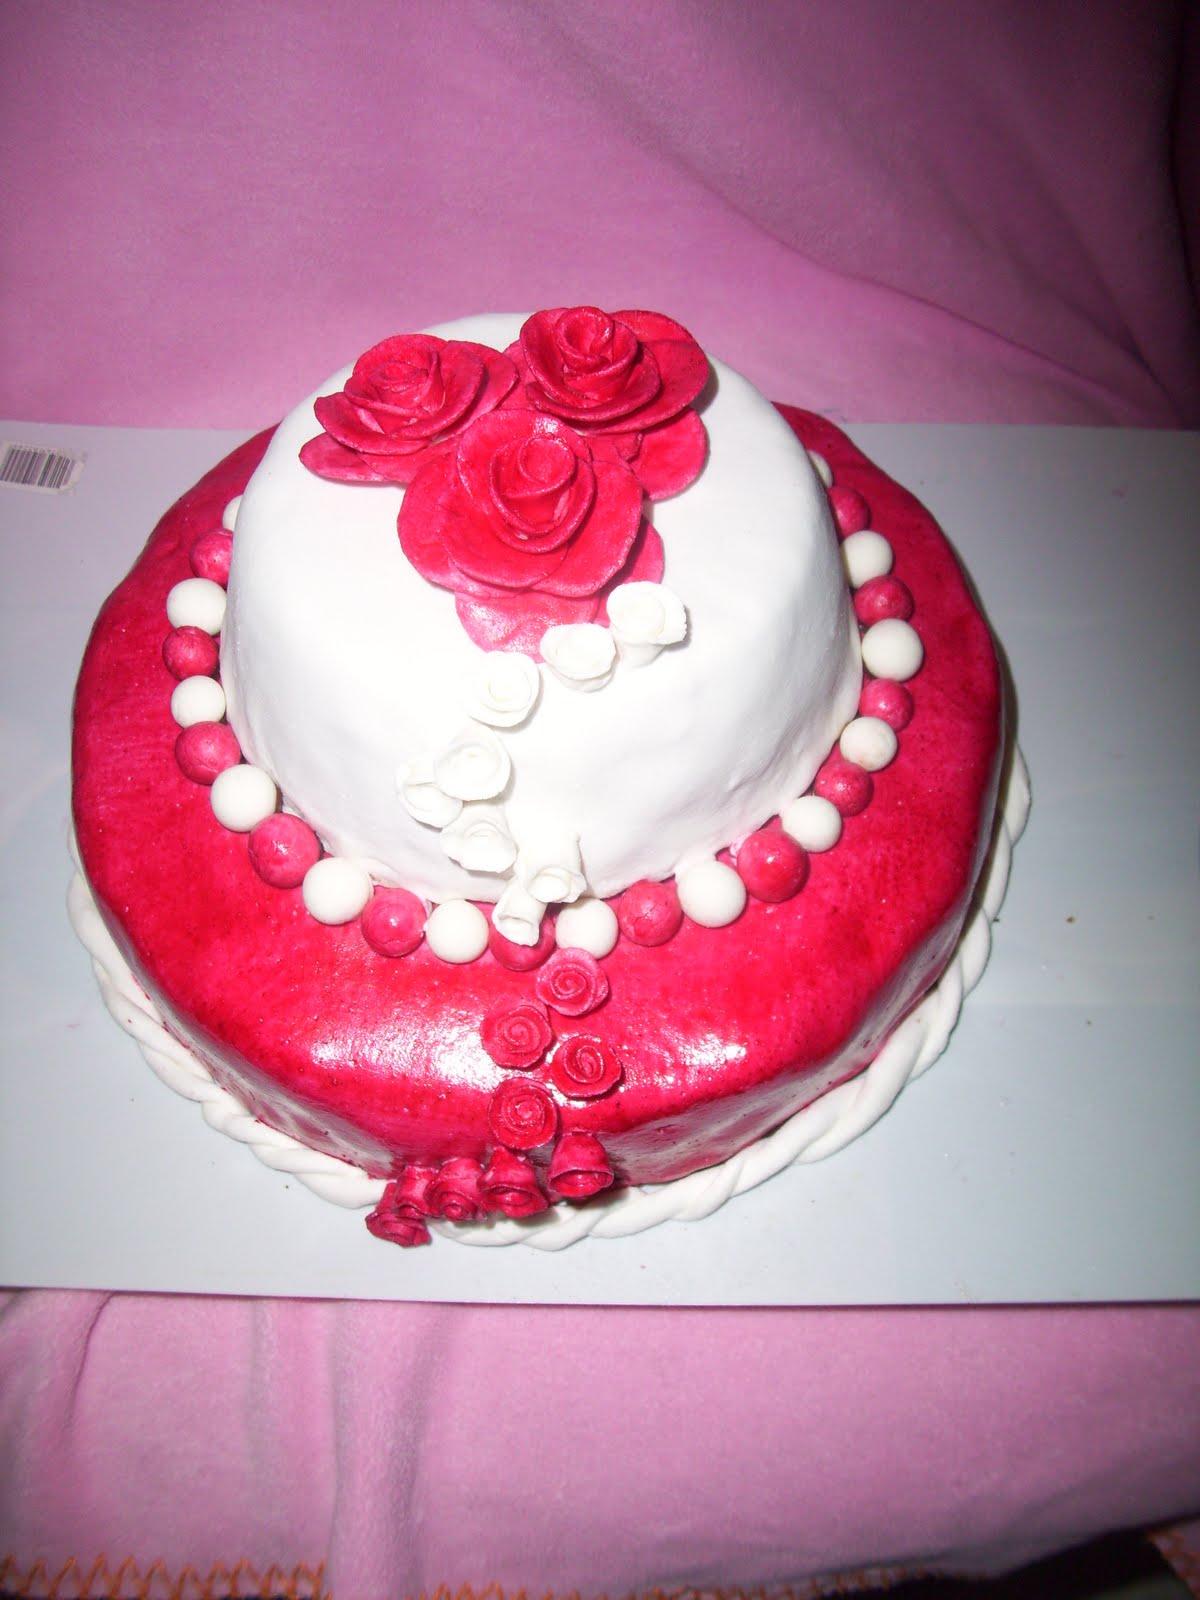 le rouge plutot fushia fonc en ralit t ralis en peigant ma pte sucre avec du colorant alimentaire liquide avec un pinceau - Colorant Alimentaire Rose Fushia